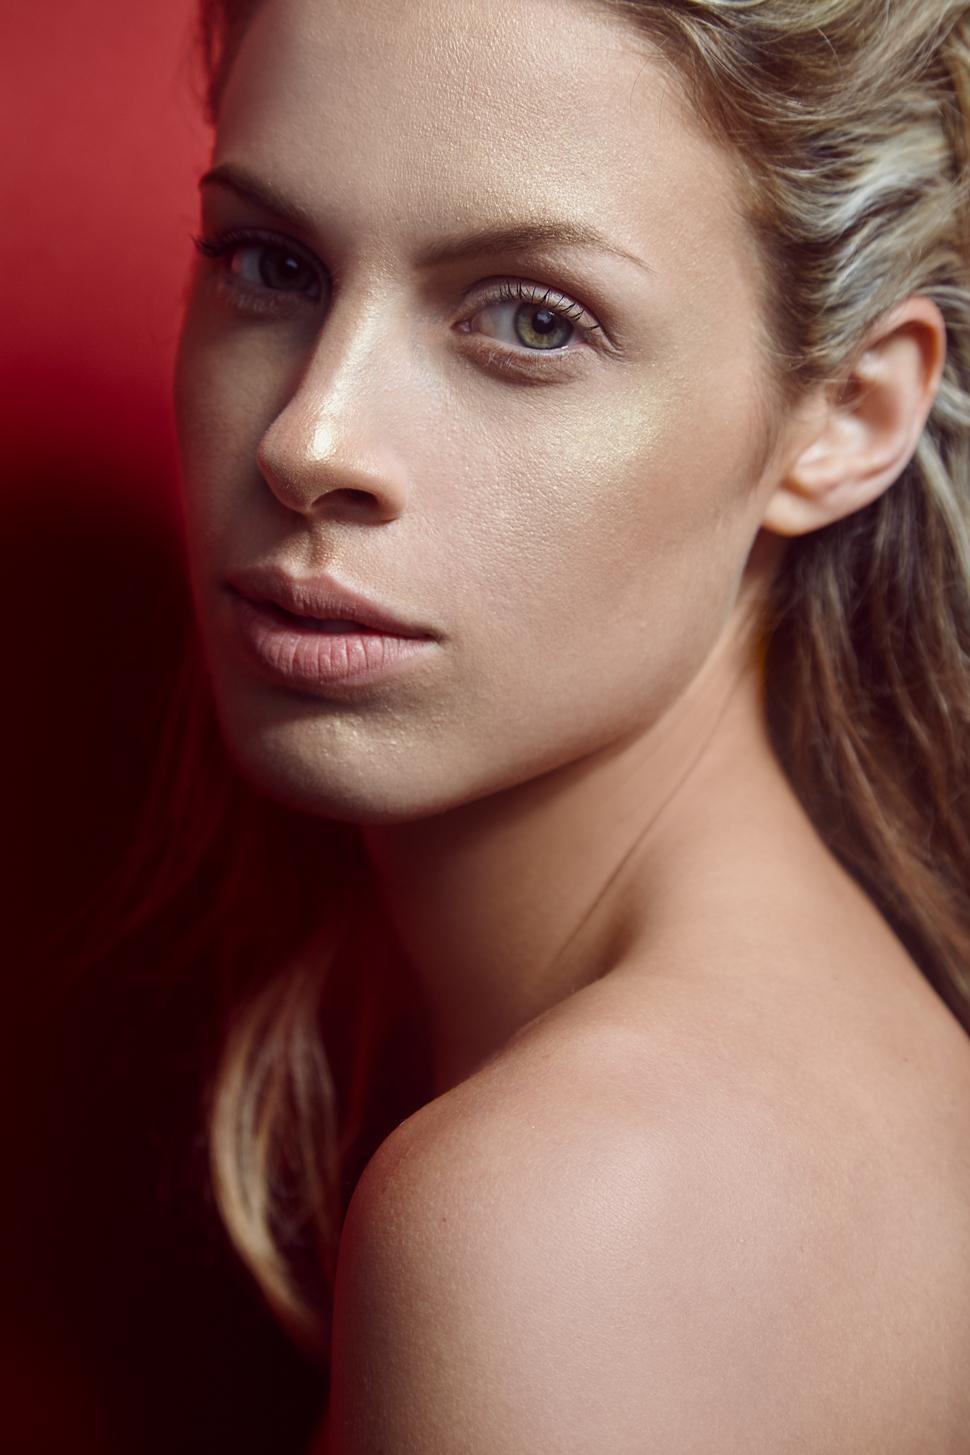 Michael Populus Photography photographs Rachel Keiffer